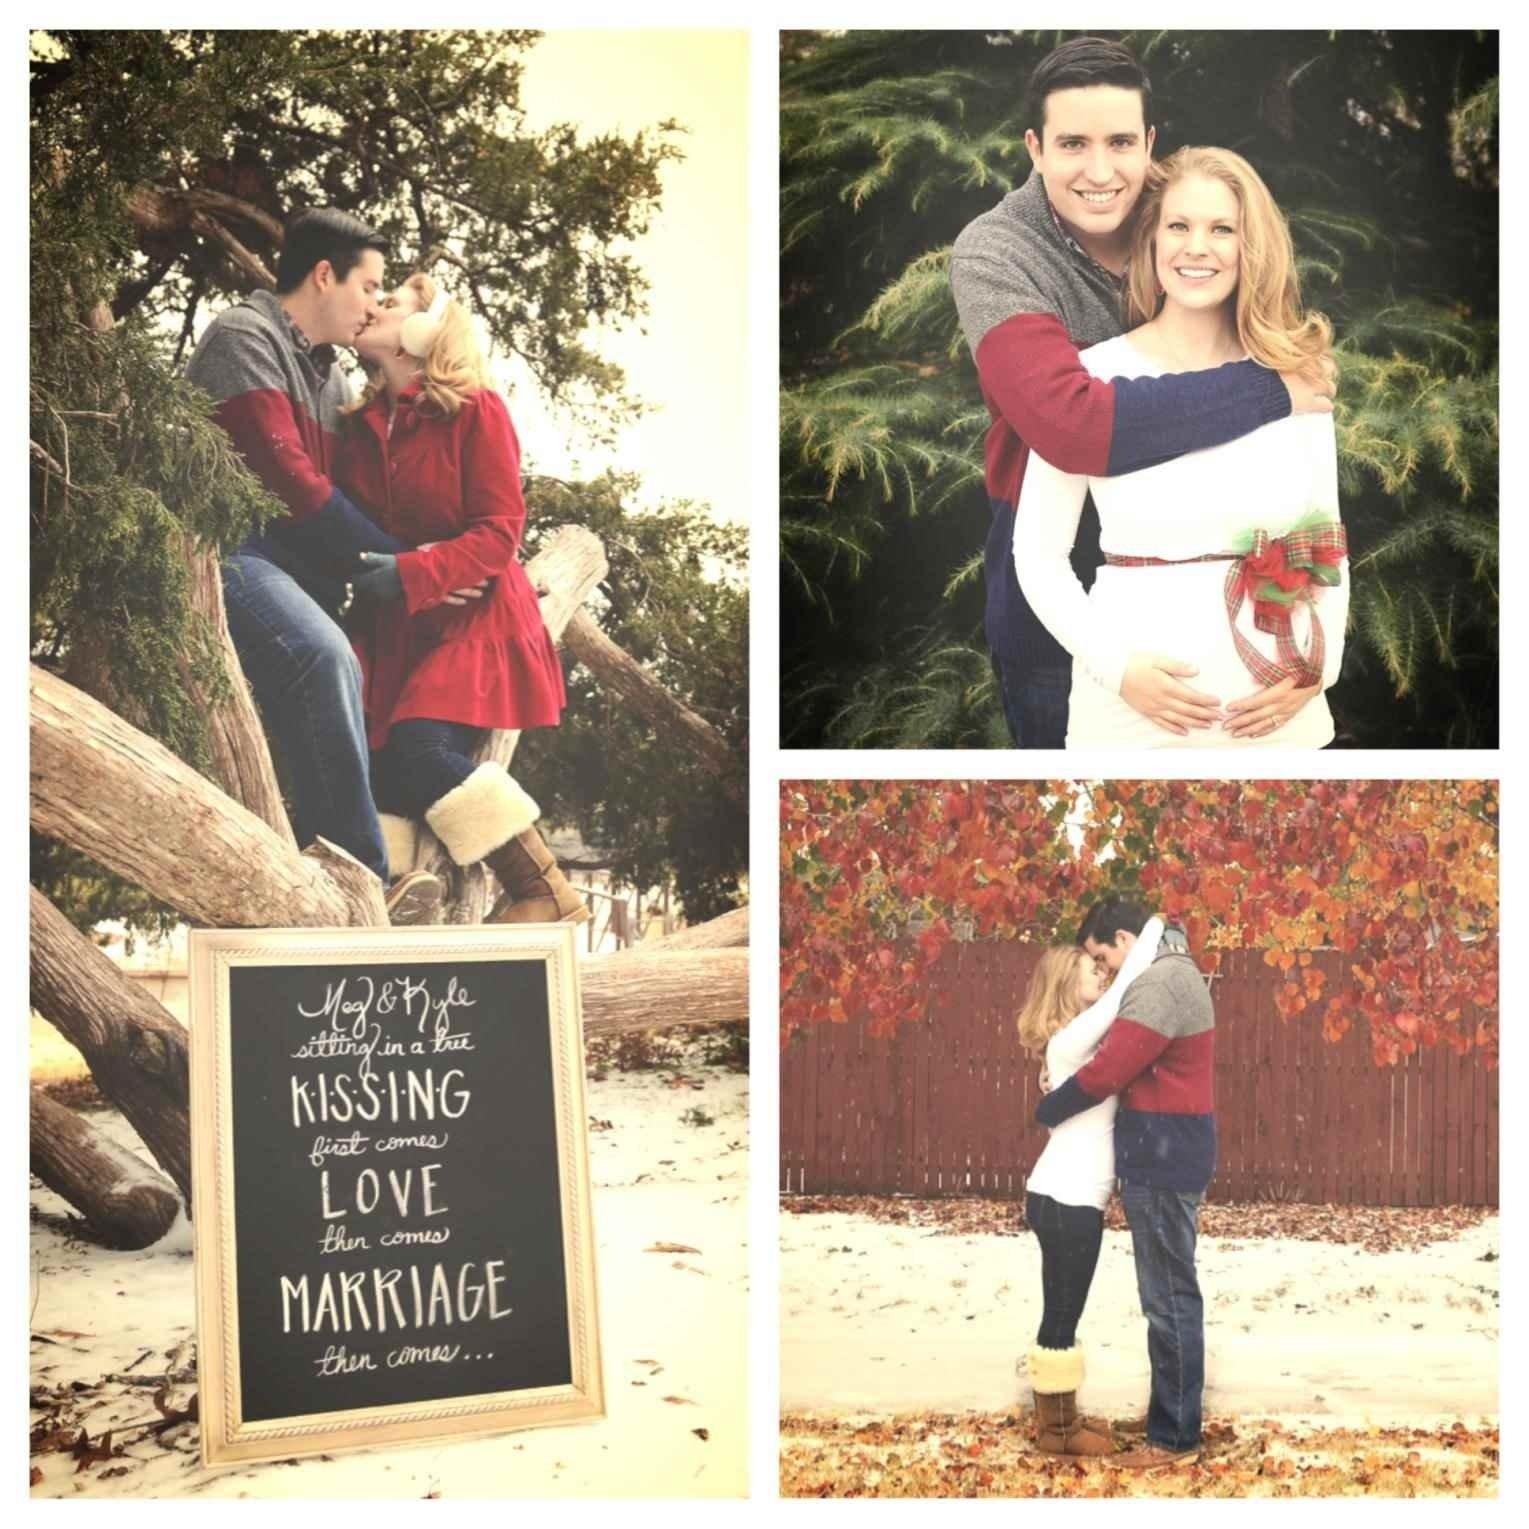 10 Fashionable Christmas Card Ideas For Couples funny christmas card photo ideas for couples merry christmas 2021